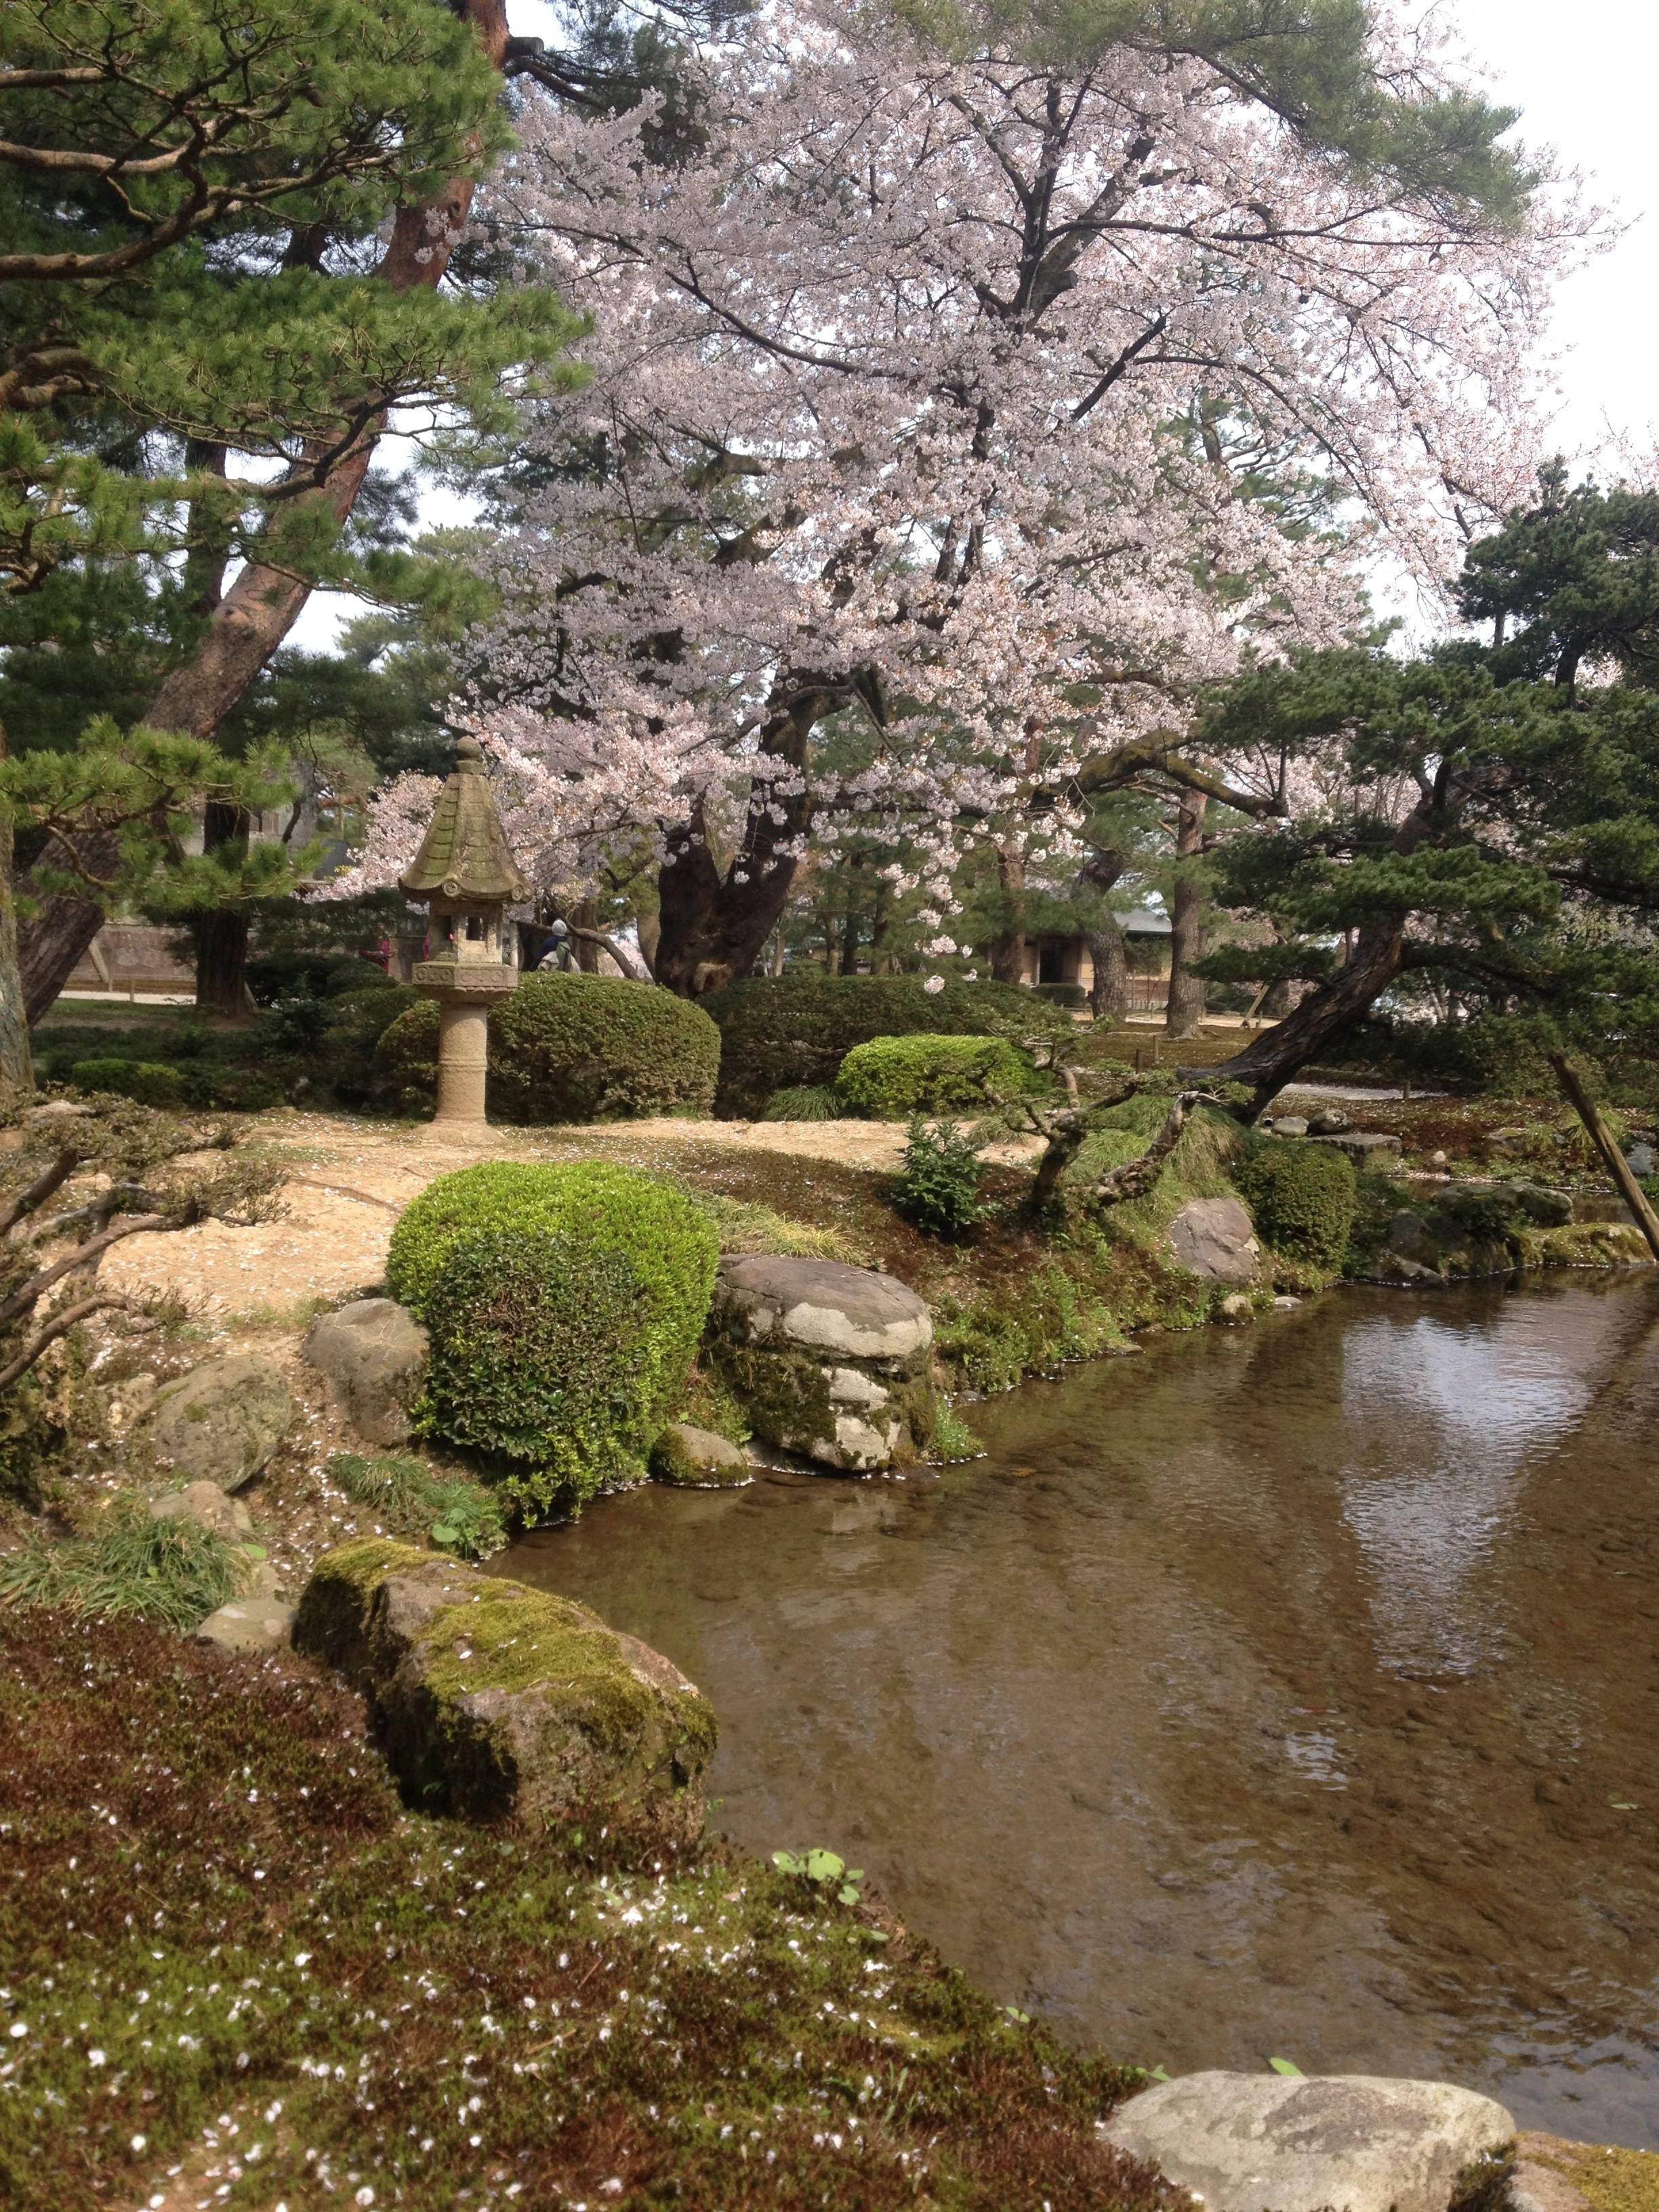 Kanazawa Castle and Kenrokuen Gardens Well Worth a Visit ...